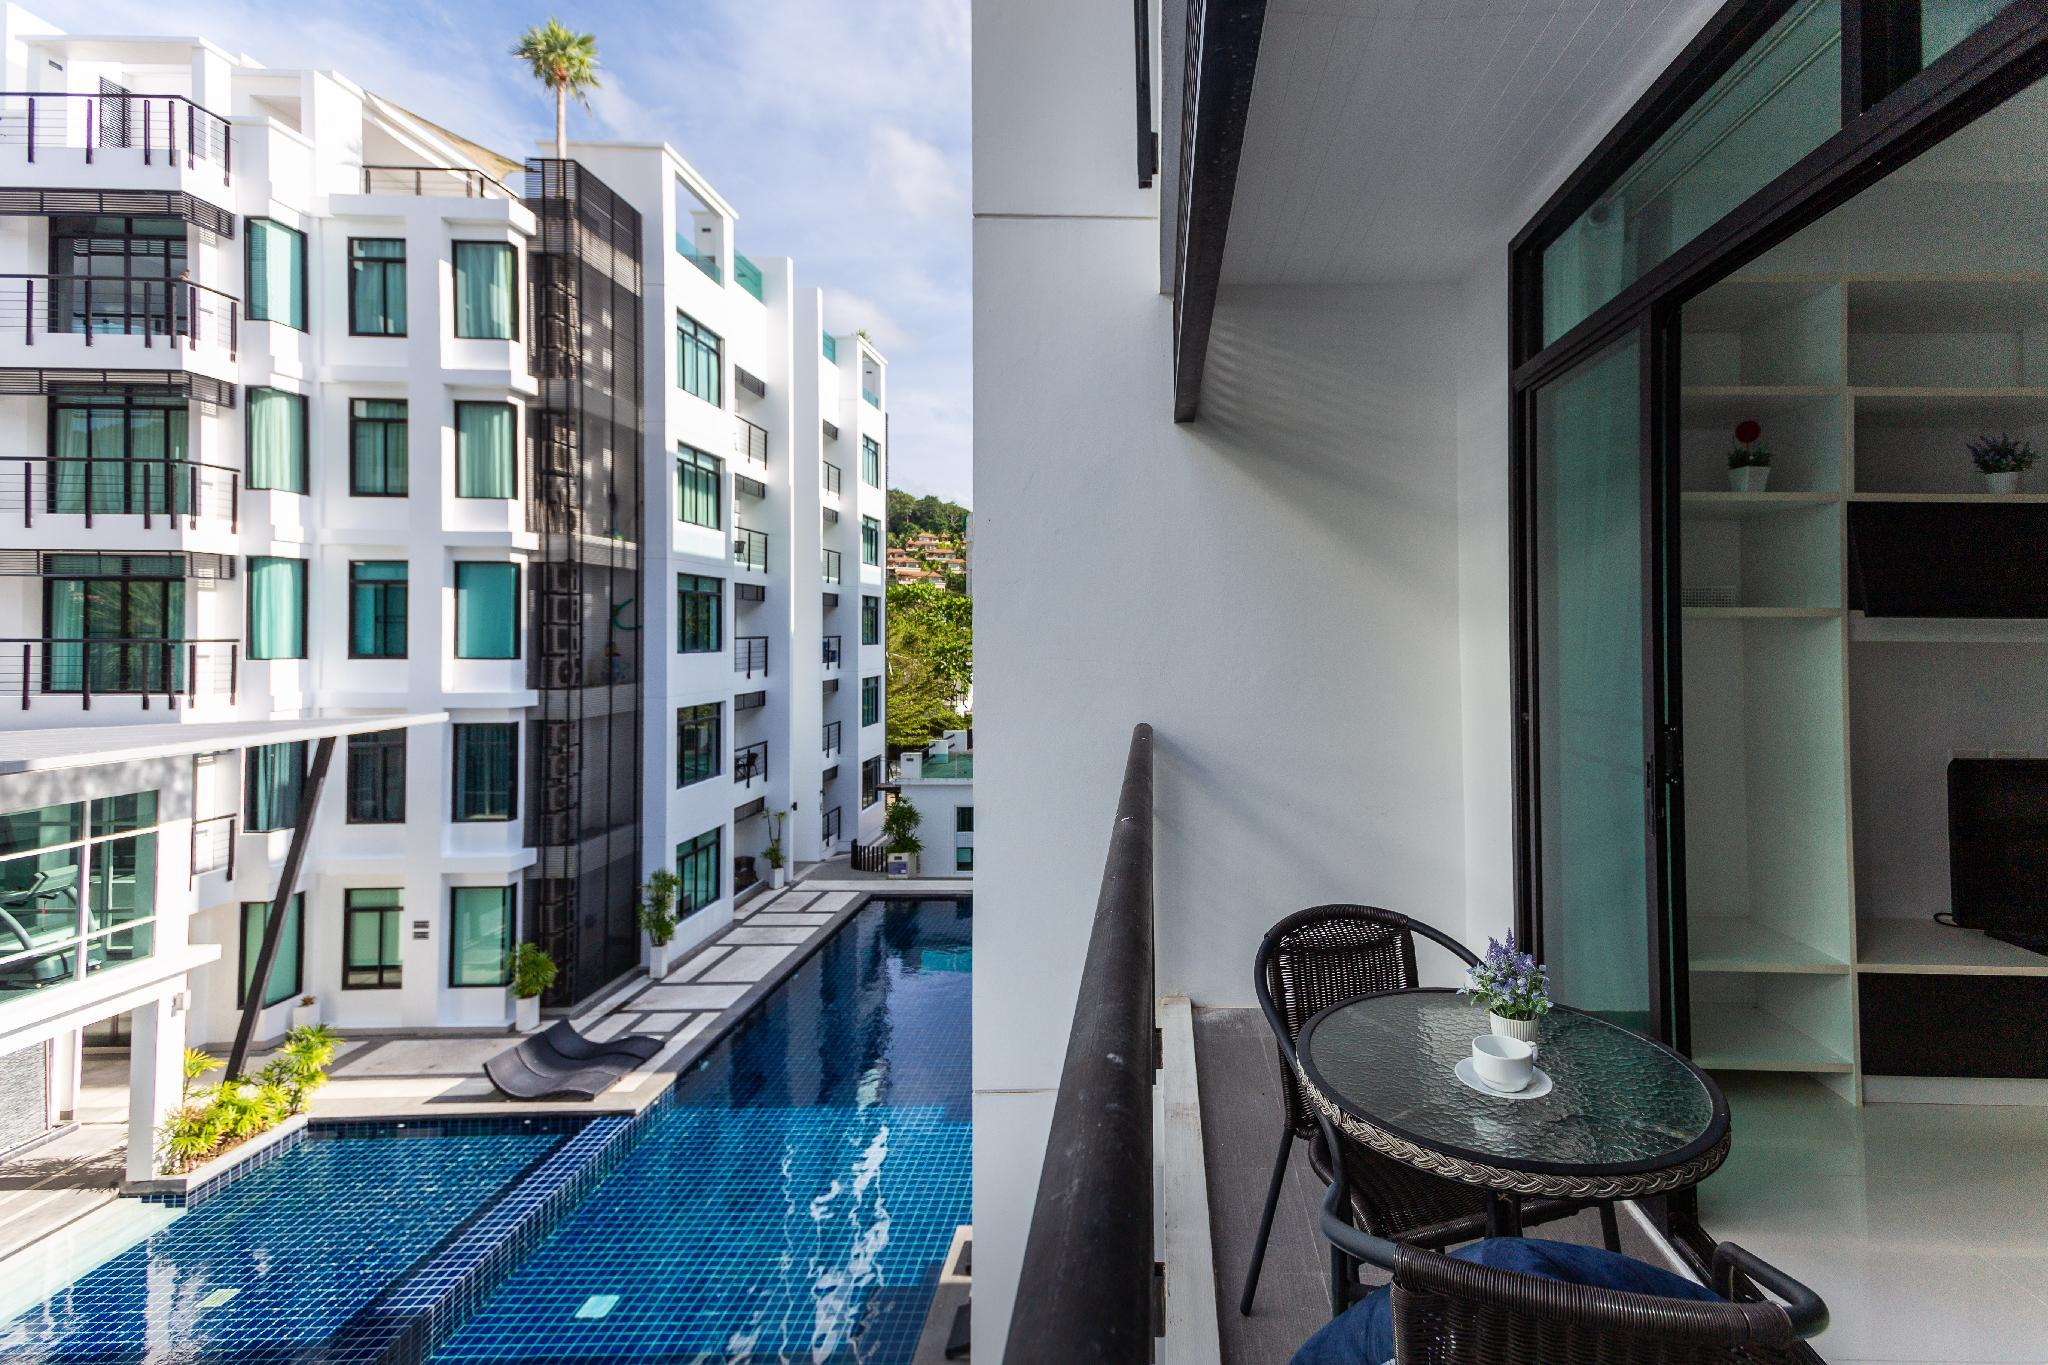 3 Bedrooms Pool View Apartment In Kamala